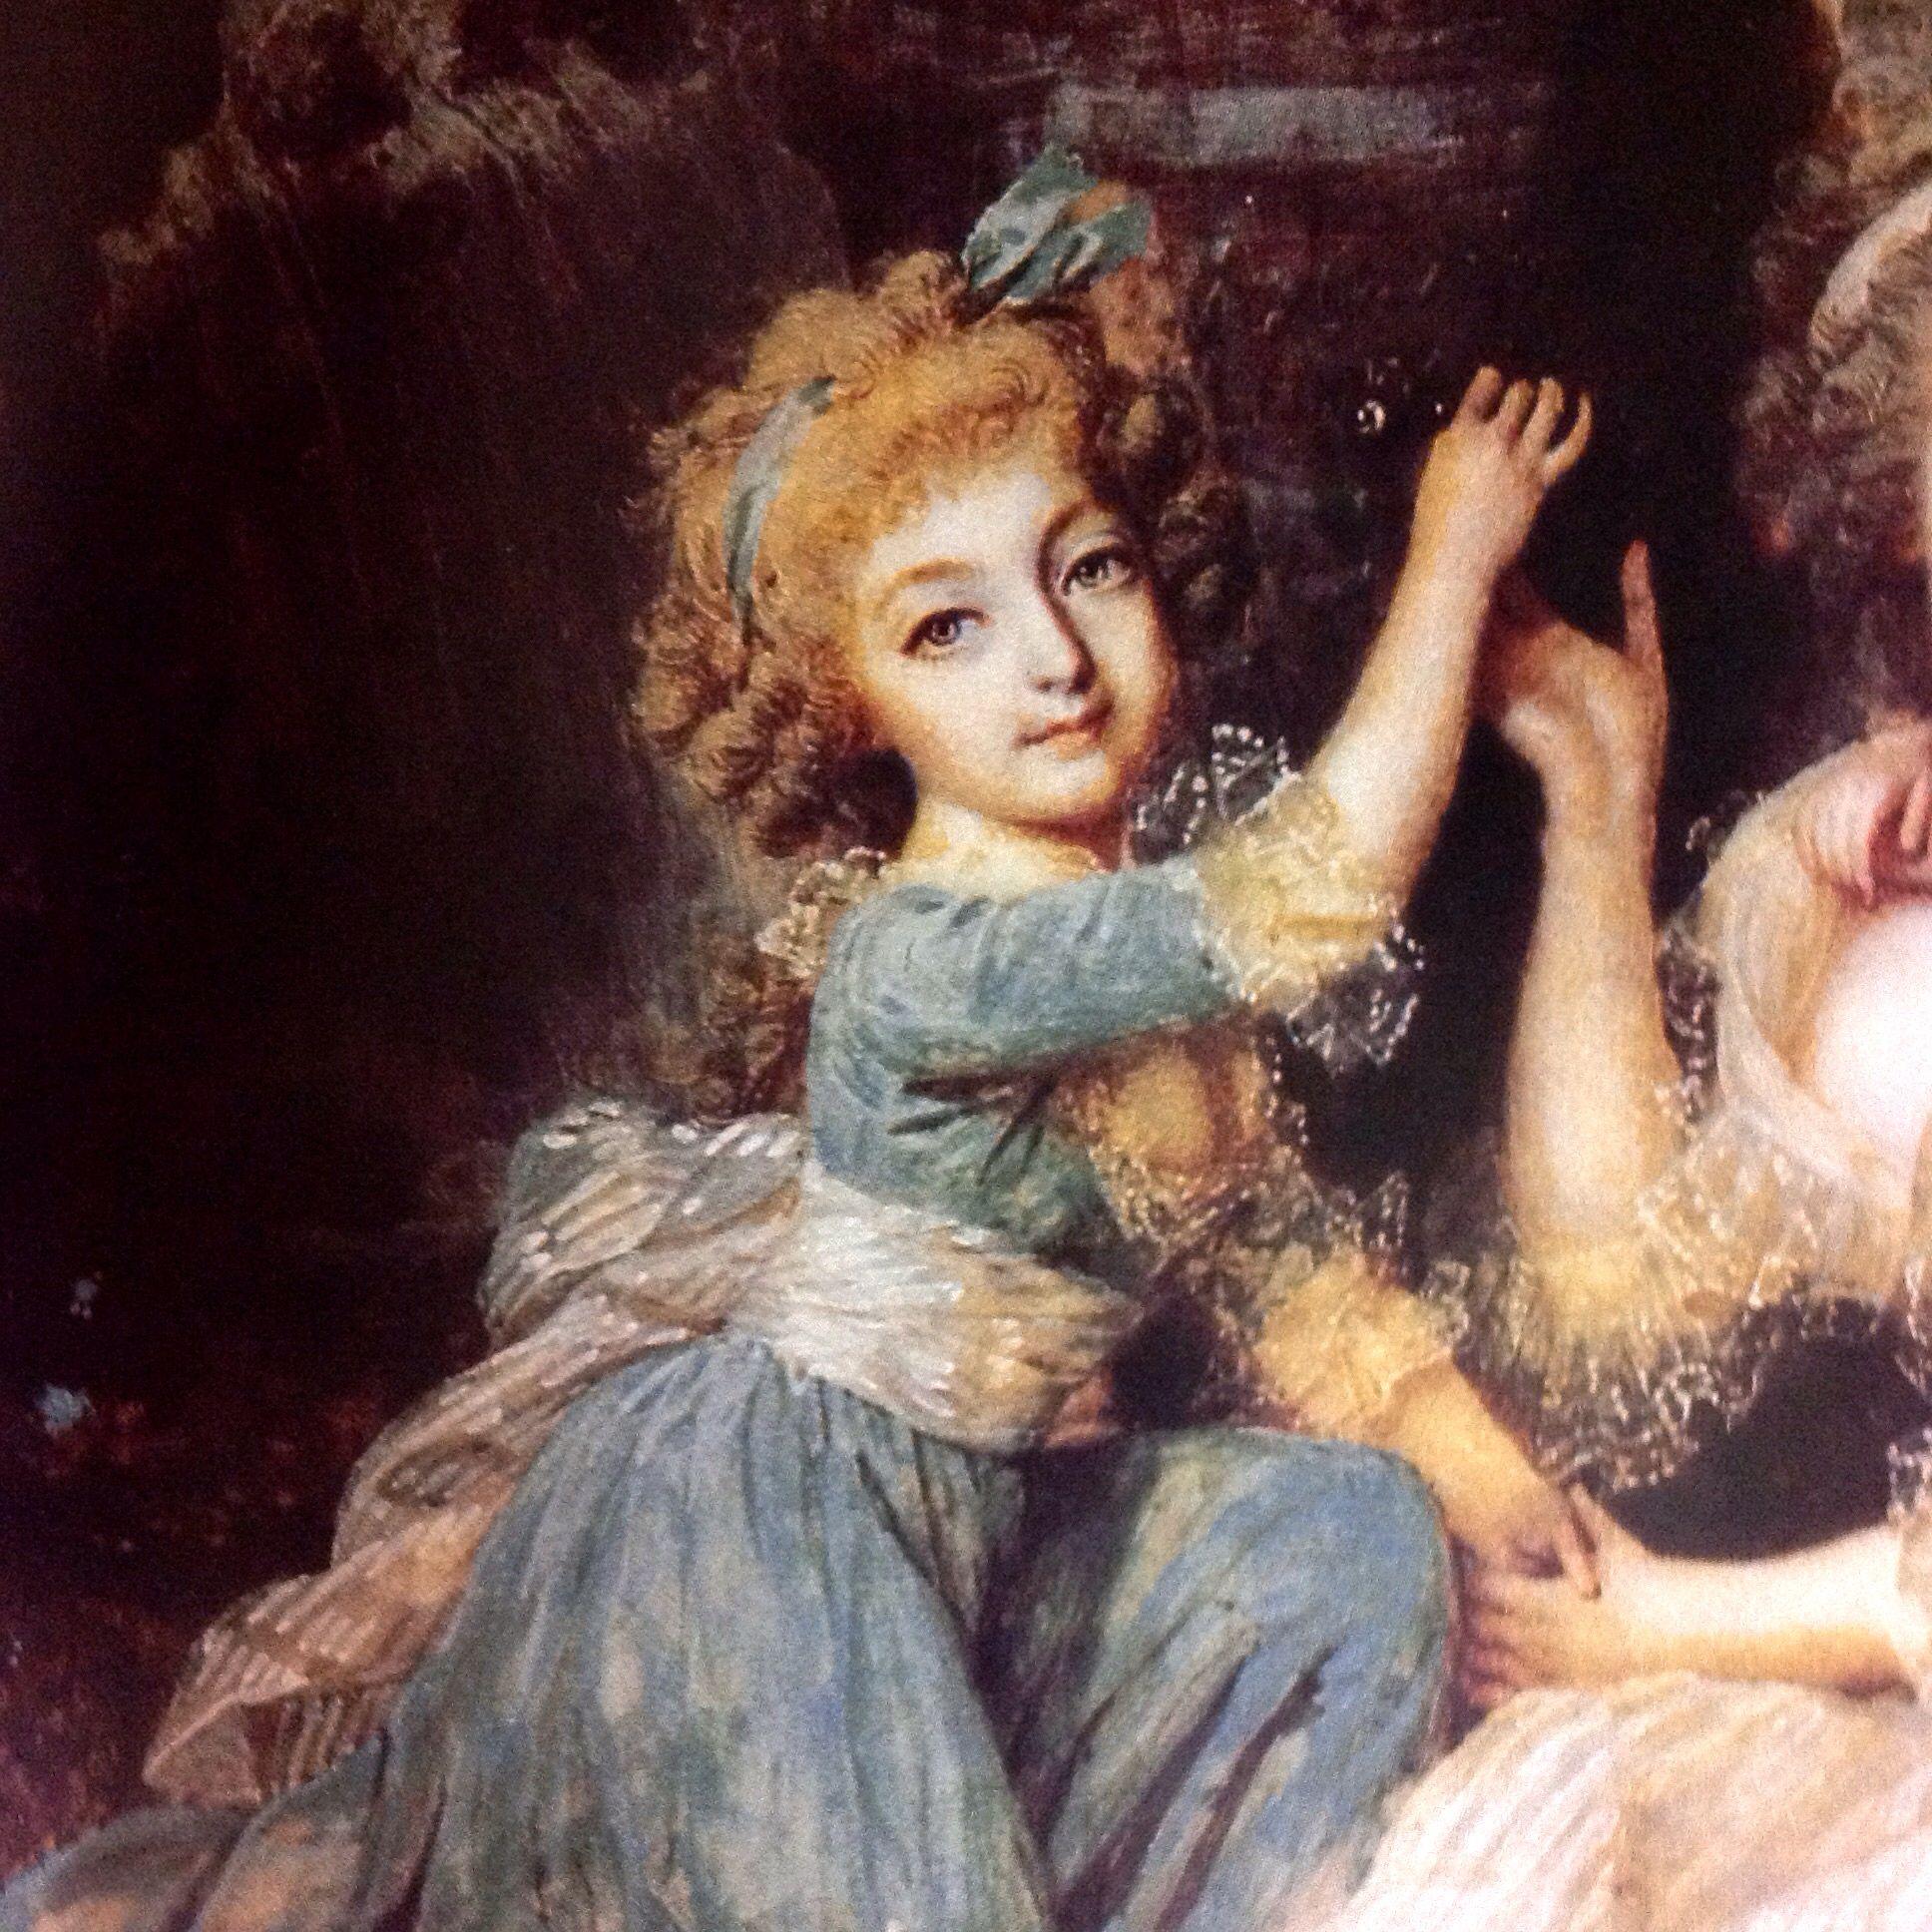 Madame Royal de una miniatura de Dumont